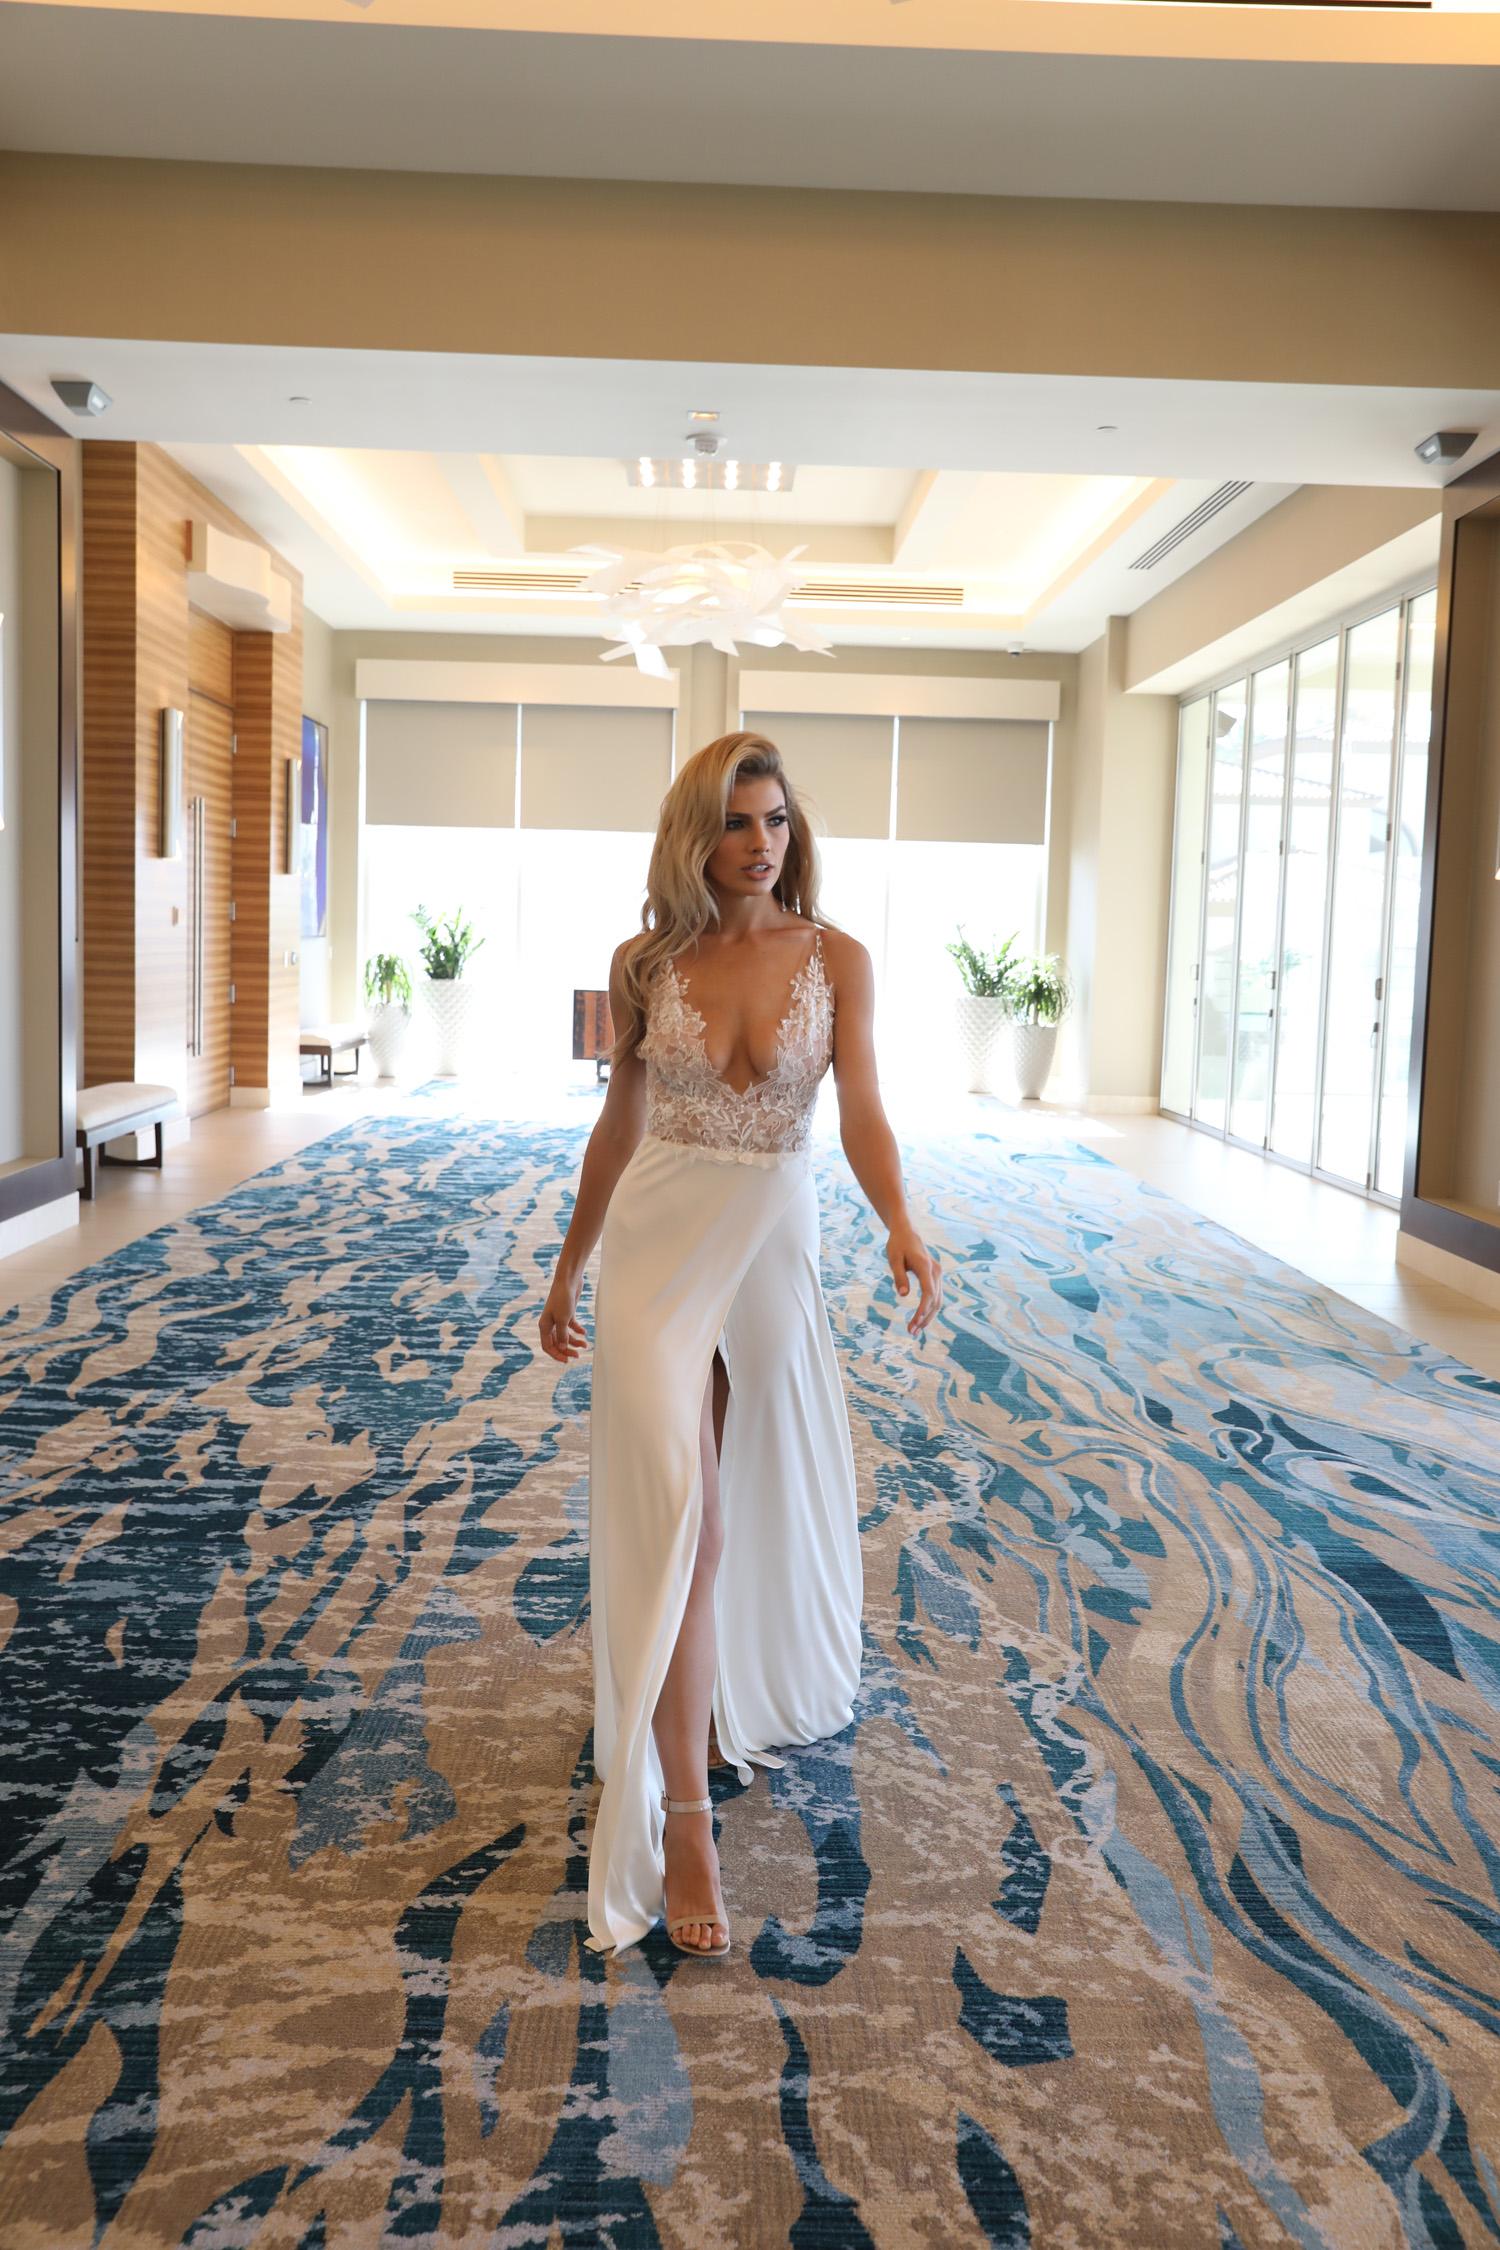 Erin Cole - Asia4 - Brautsalat